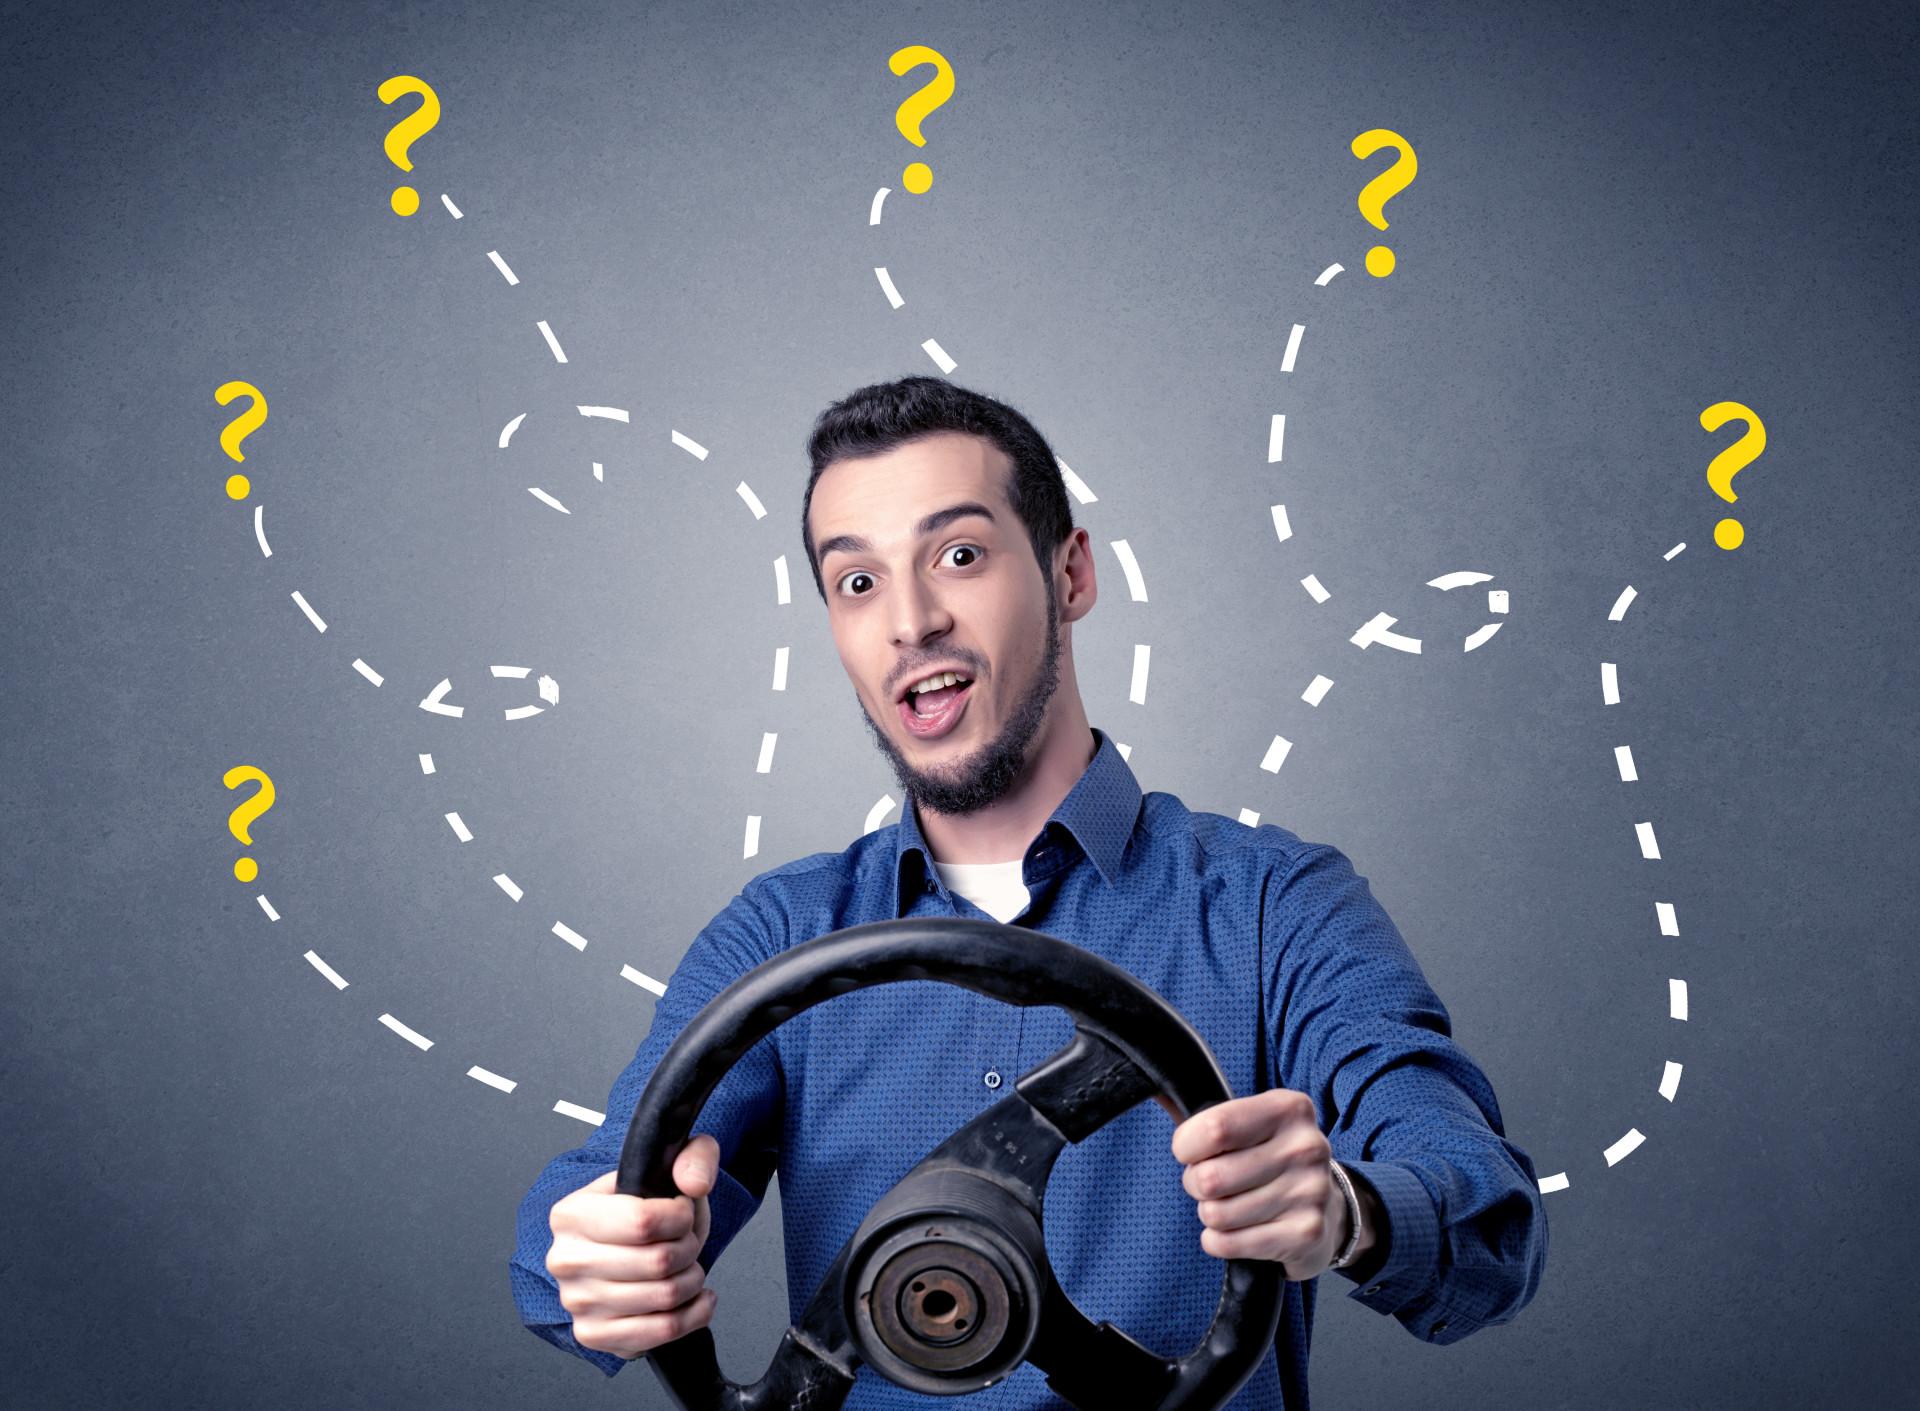 Sabe porque o nosso corpo reage de forma impulsiva?